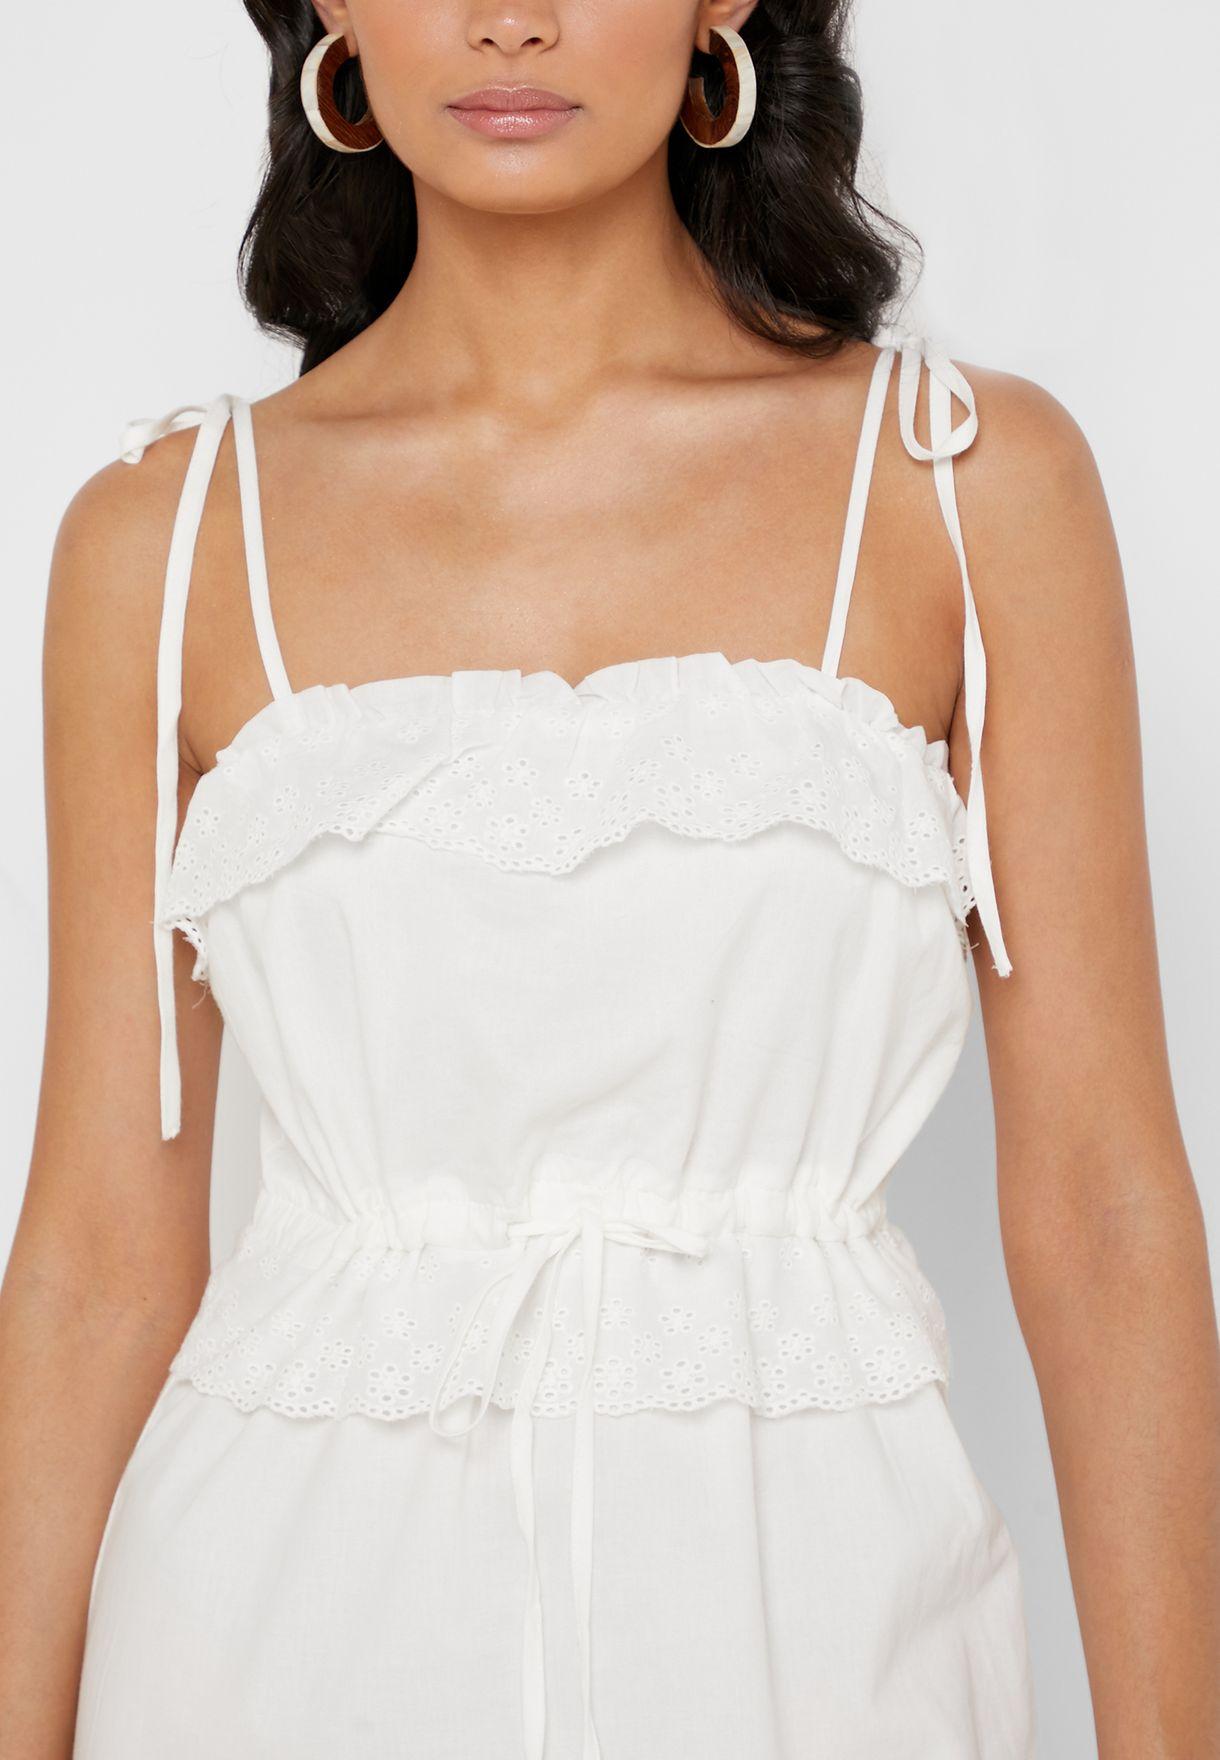 Tie Strap Lace Trim Dress